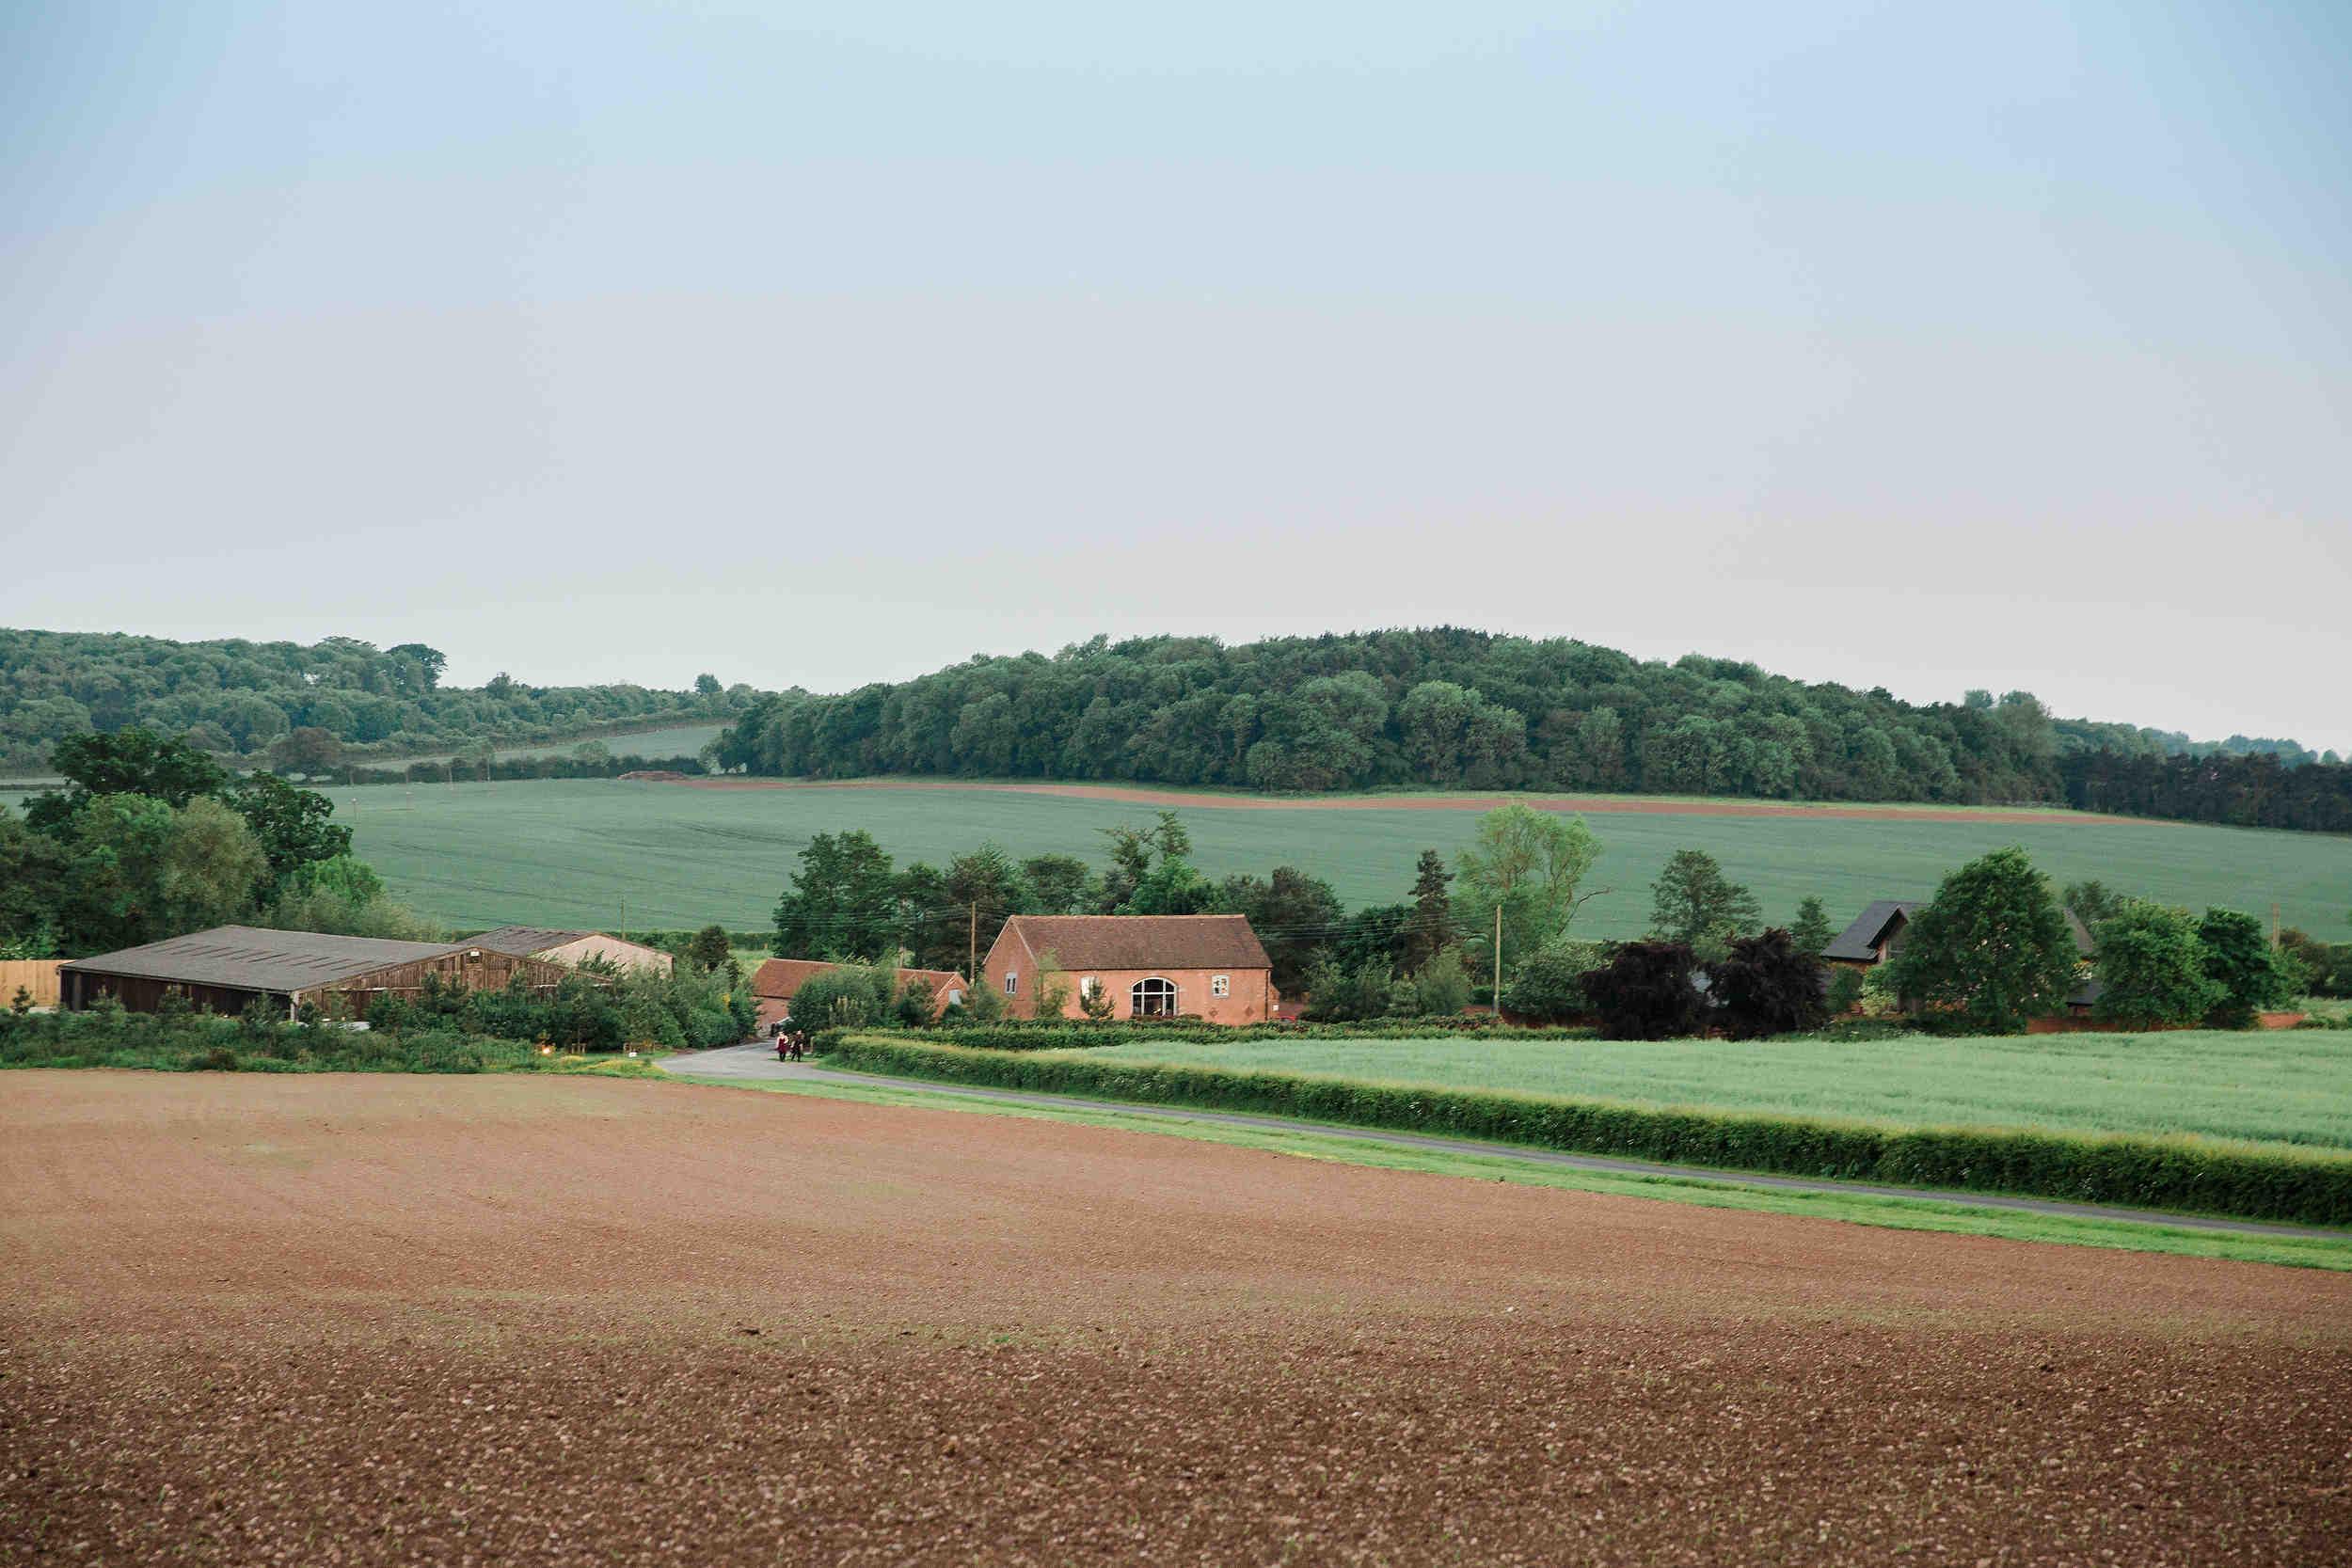 swallows nest barn landscape photo